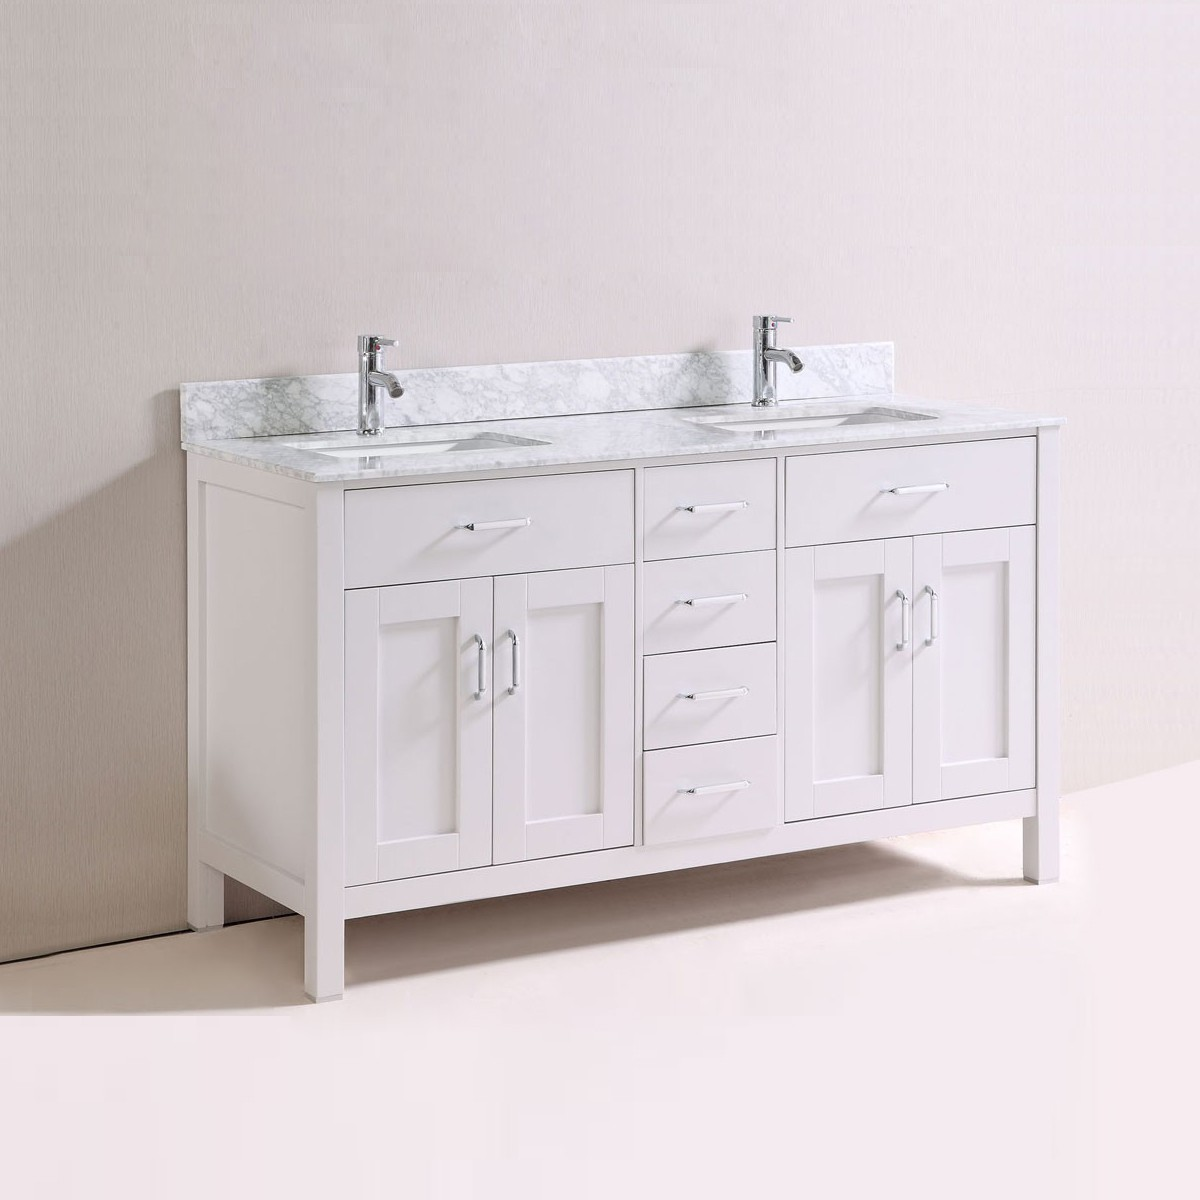 60 In. Freestanding Bathroom Vanity (DK-T9150-60-V)